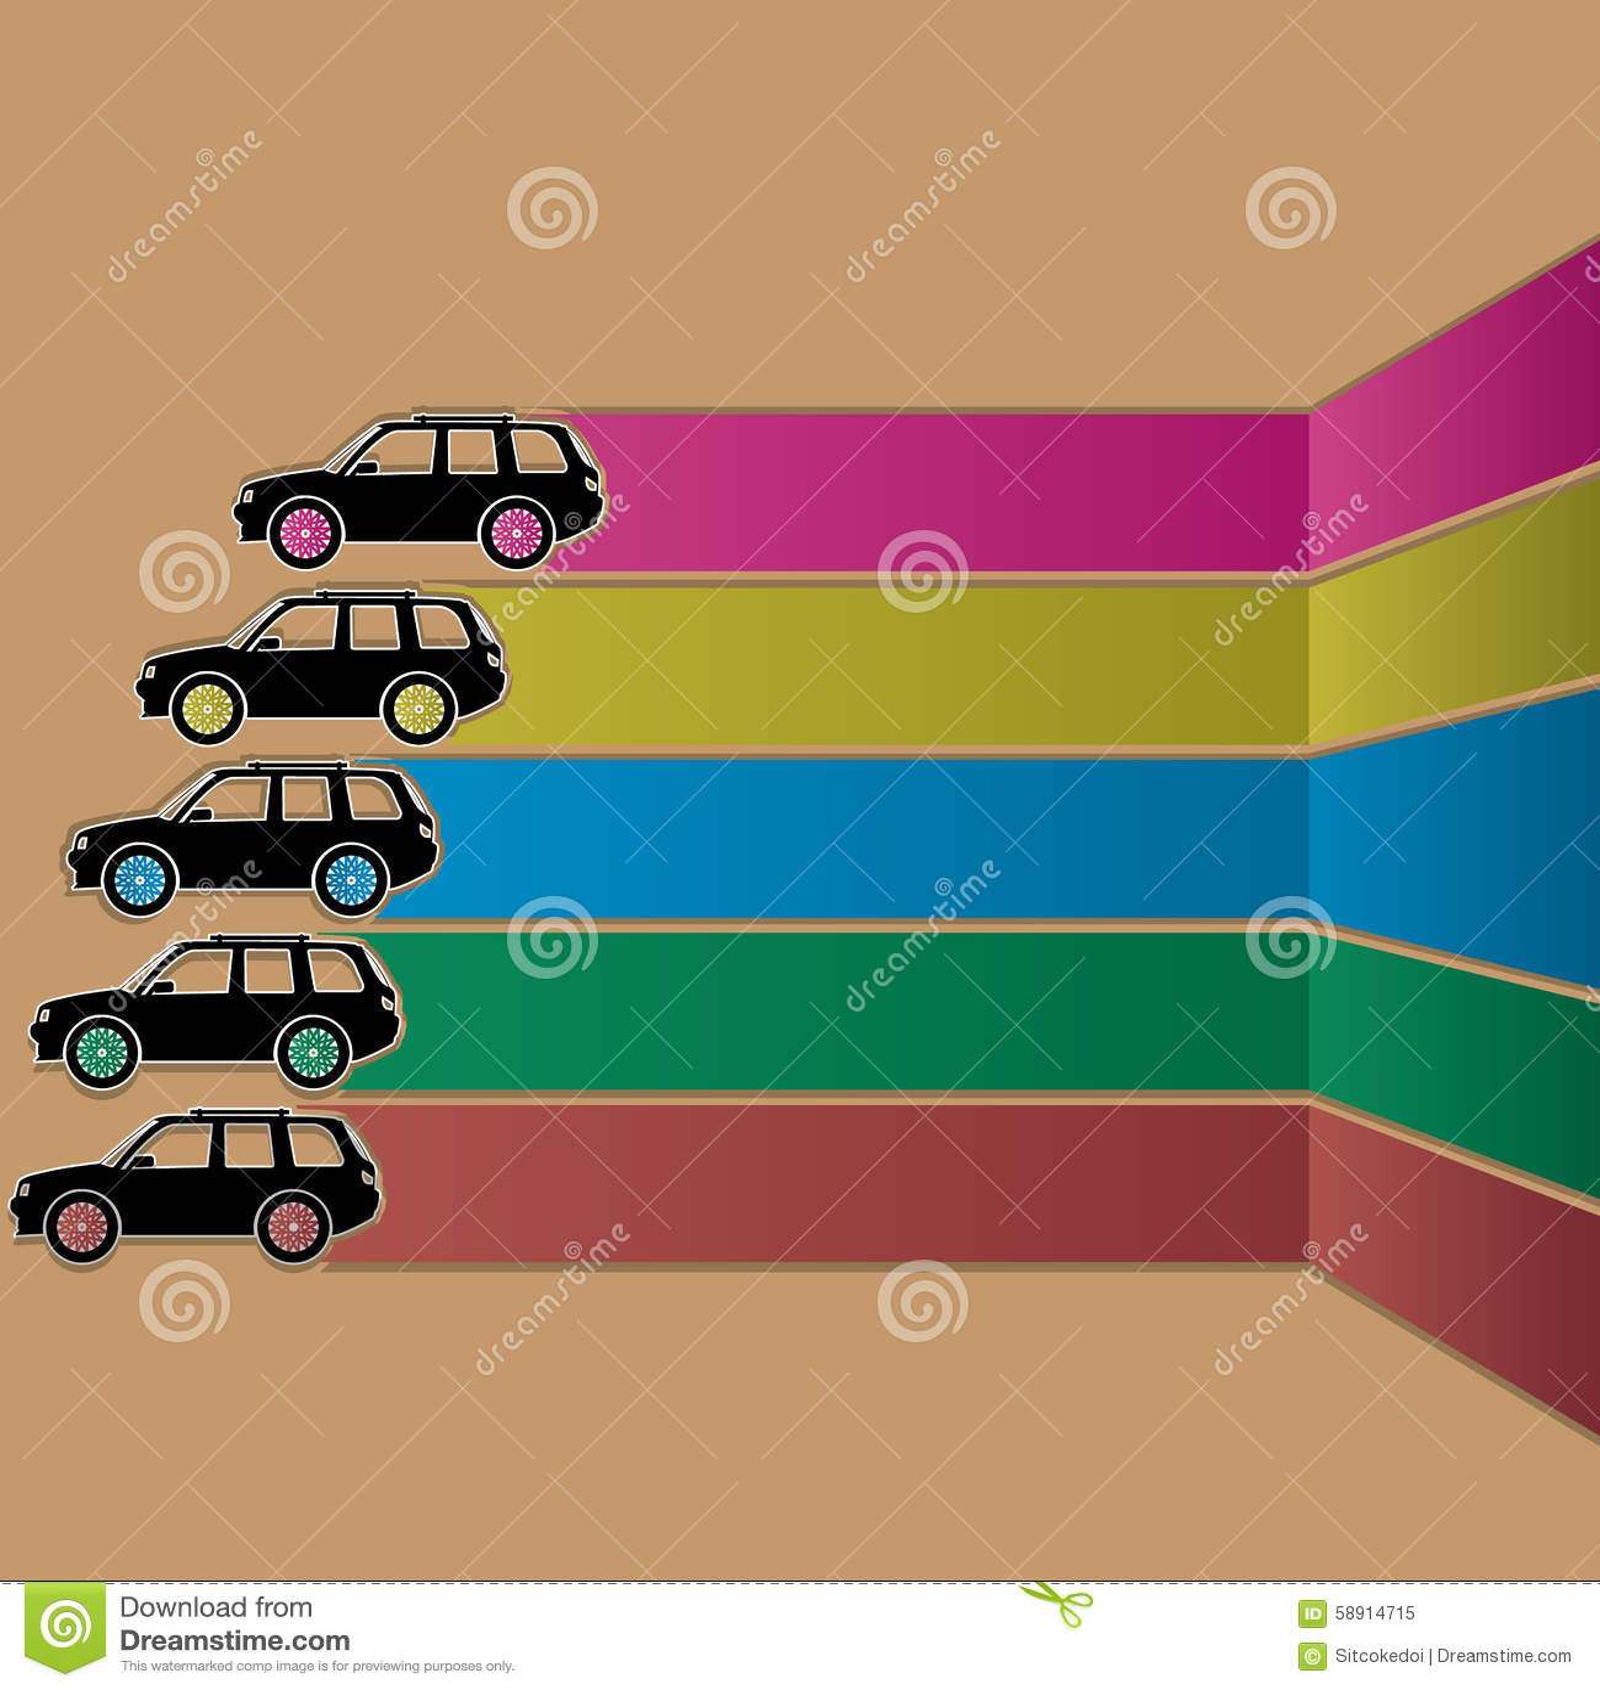 Car sticker design download - Black Car Sticker And Stripe Color